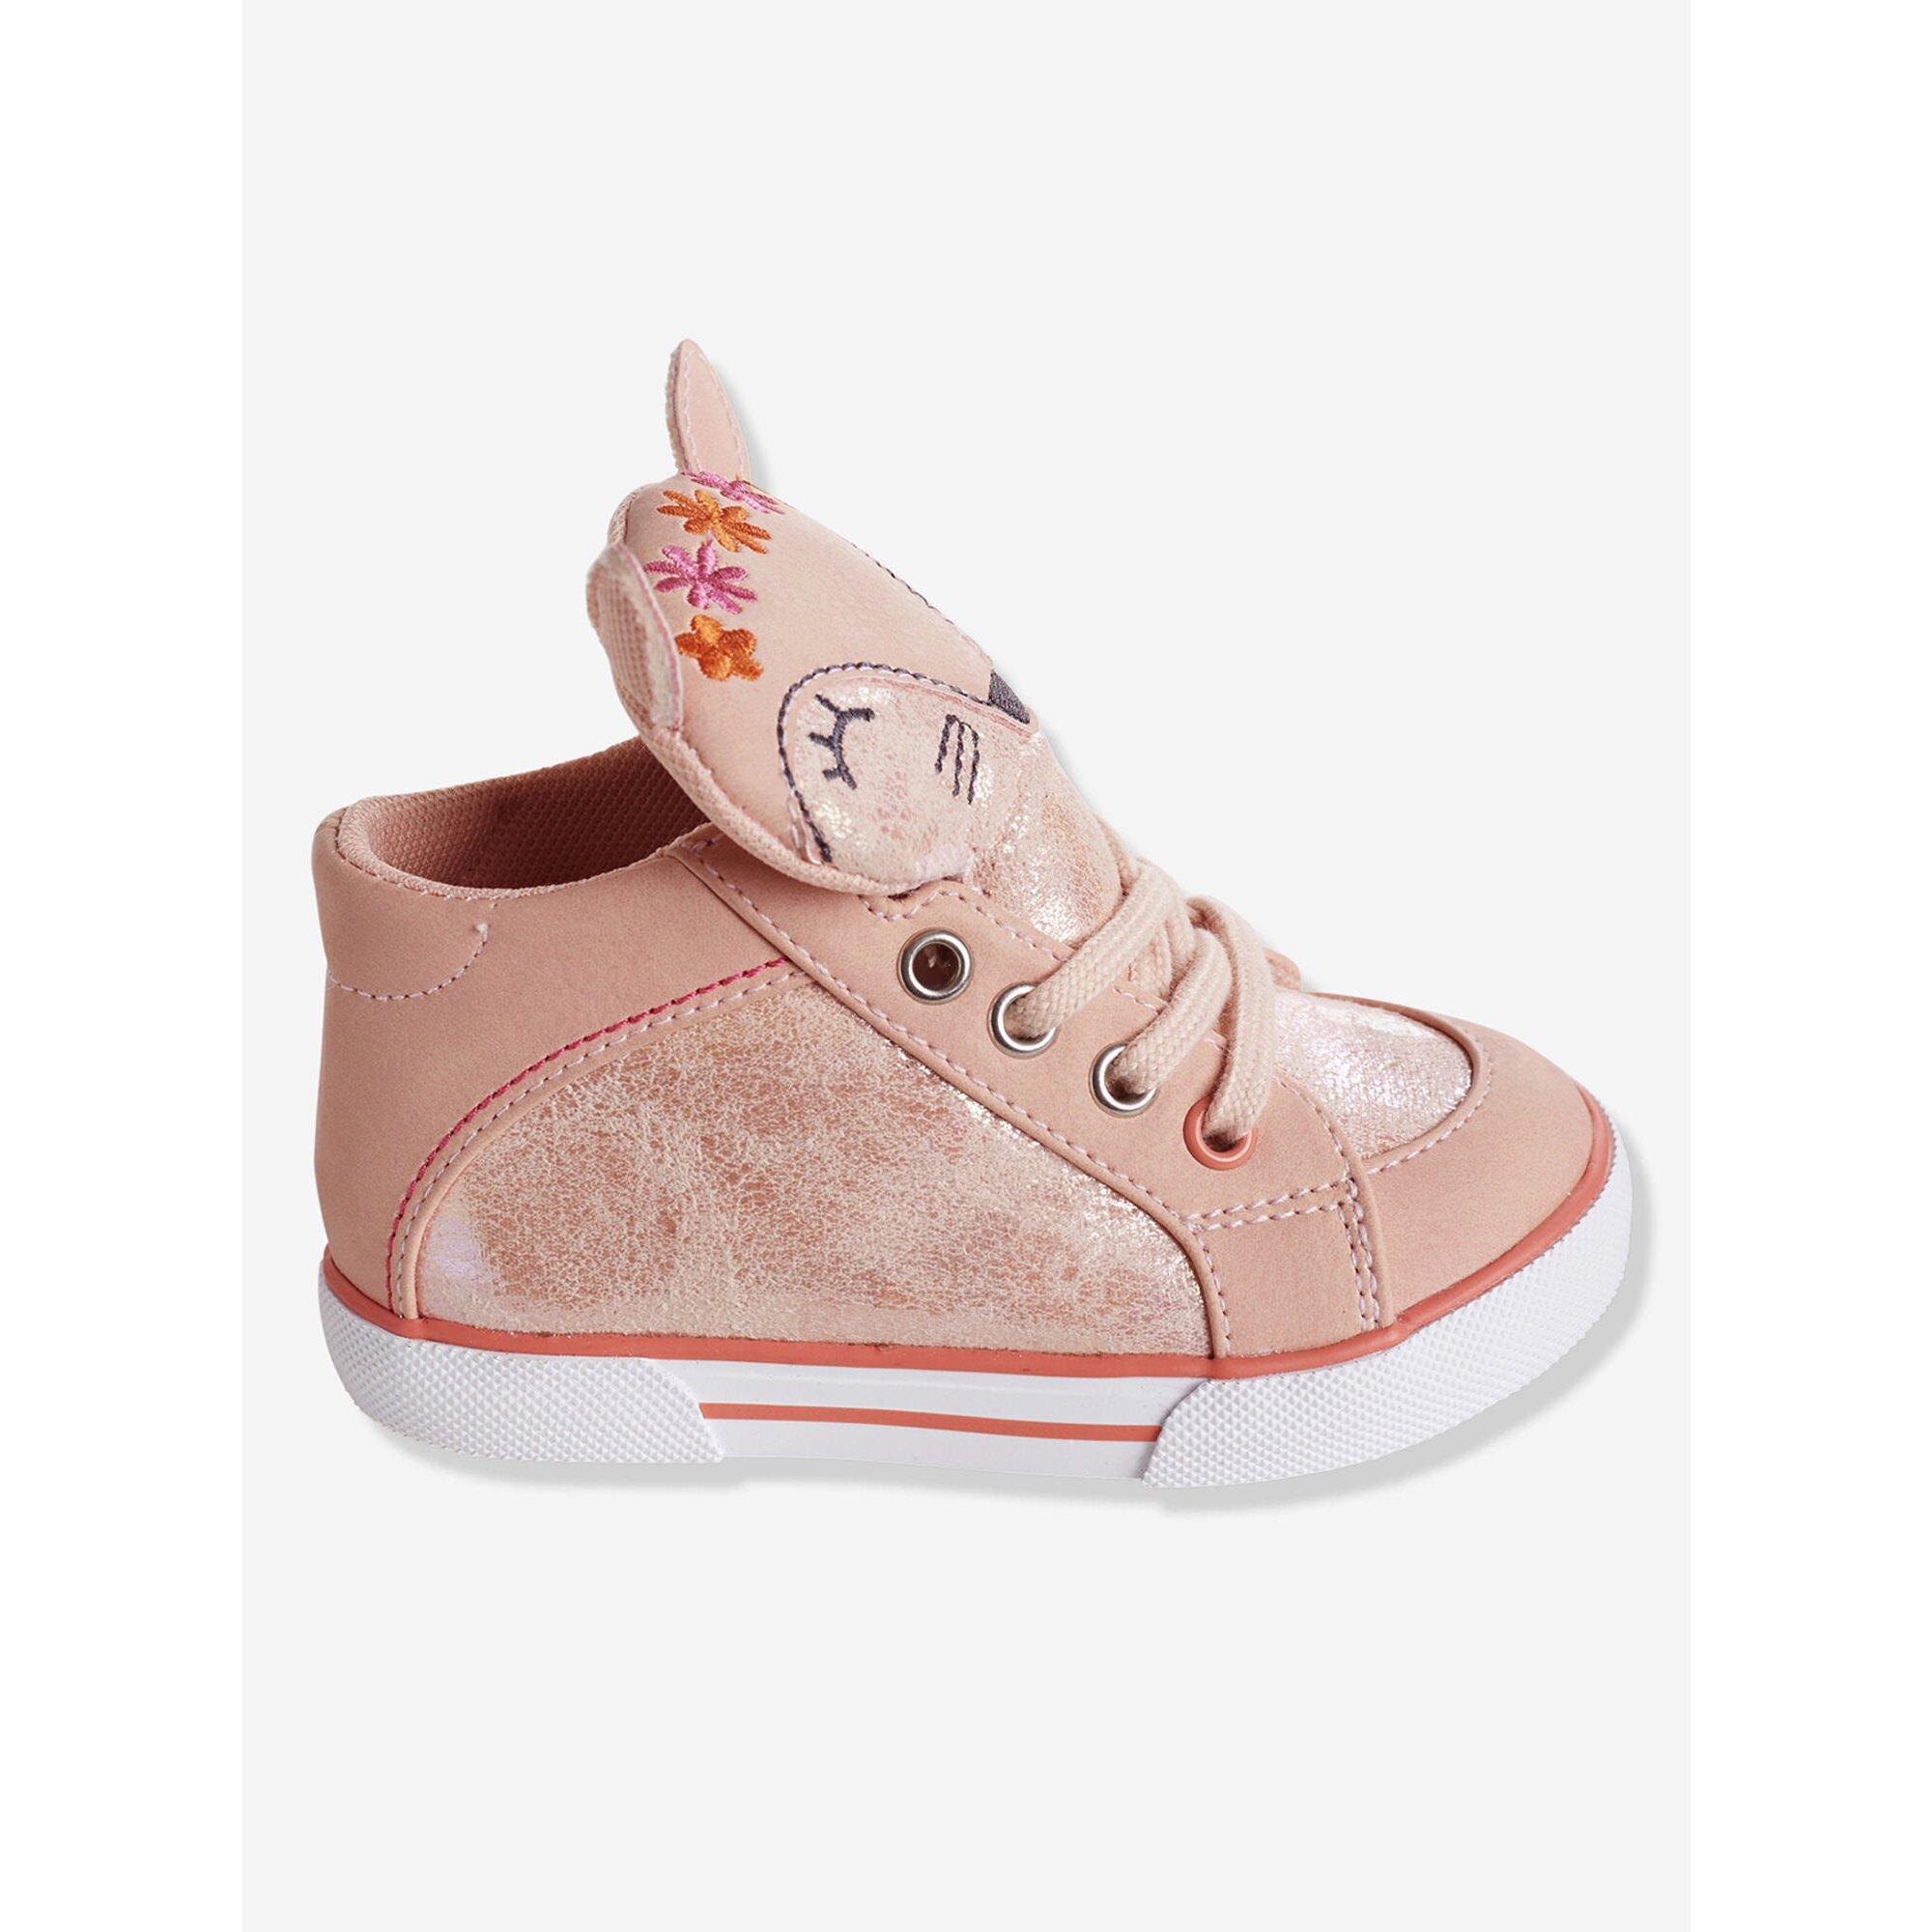 vertbaudet-sneakers-fur-madchen-schnurung, 30.99 EUR @ babywalz-de